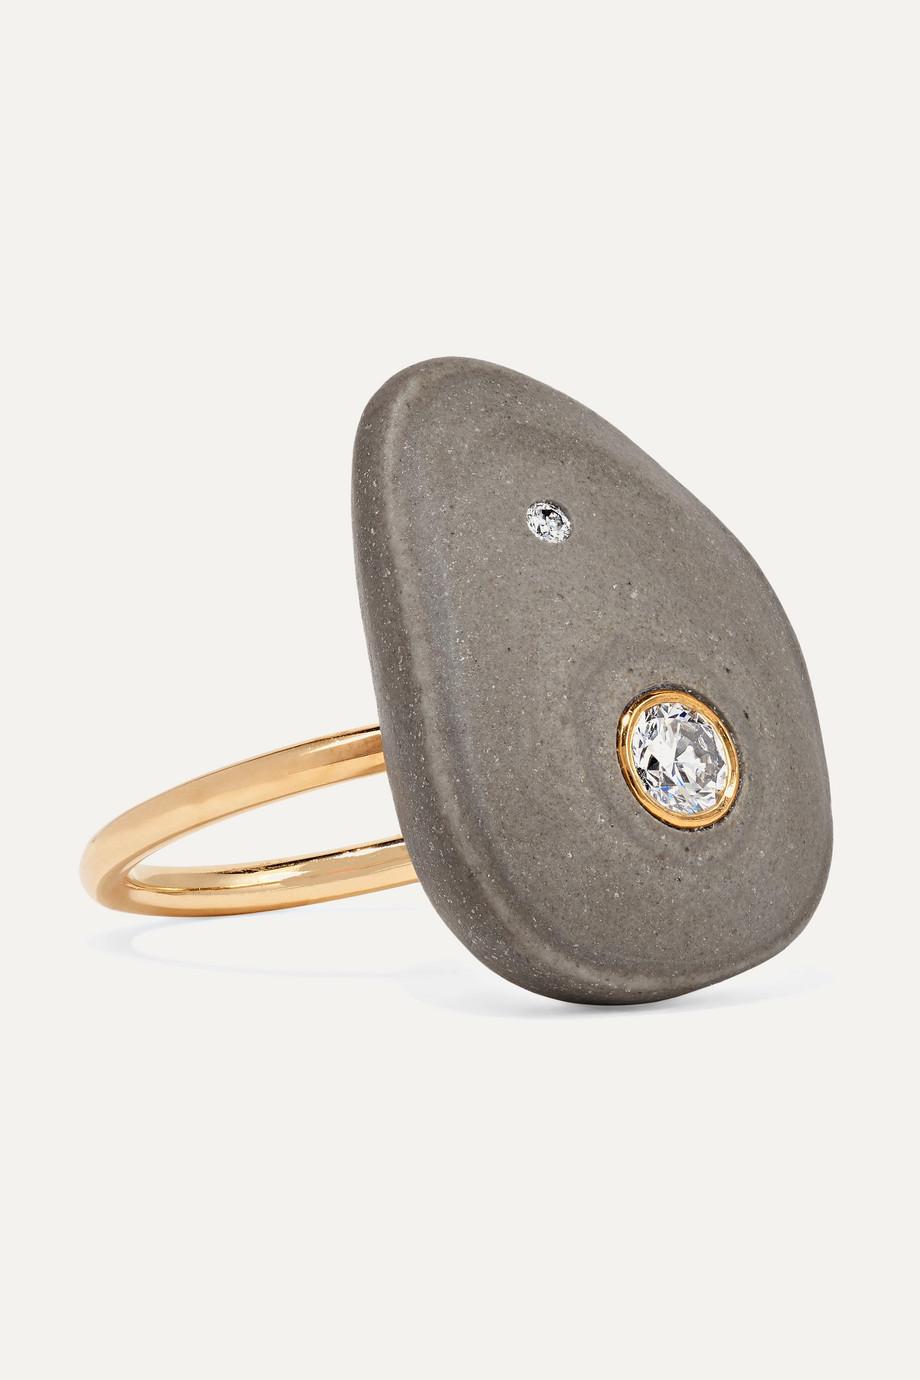 CVC Stones El Chichon 18-karat gold, stone and diamond ring